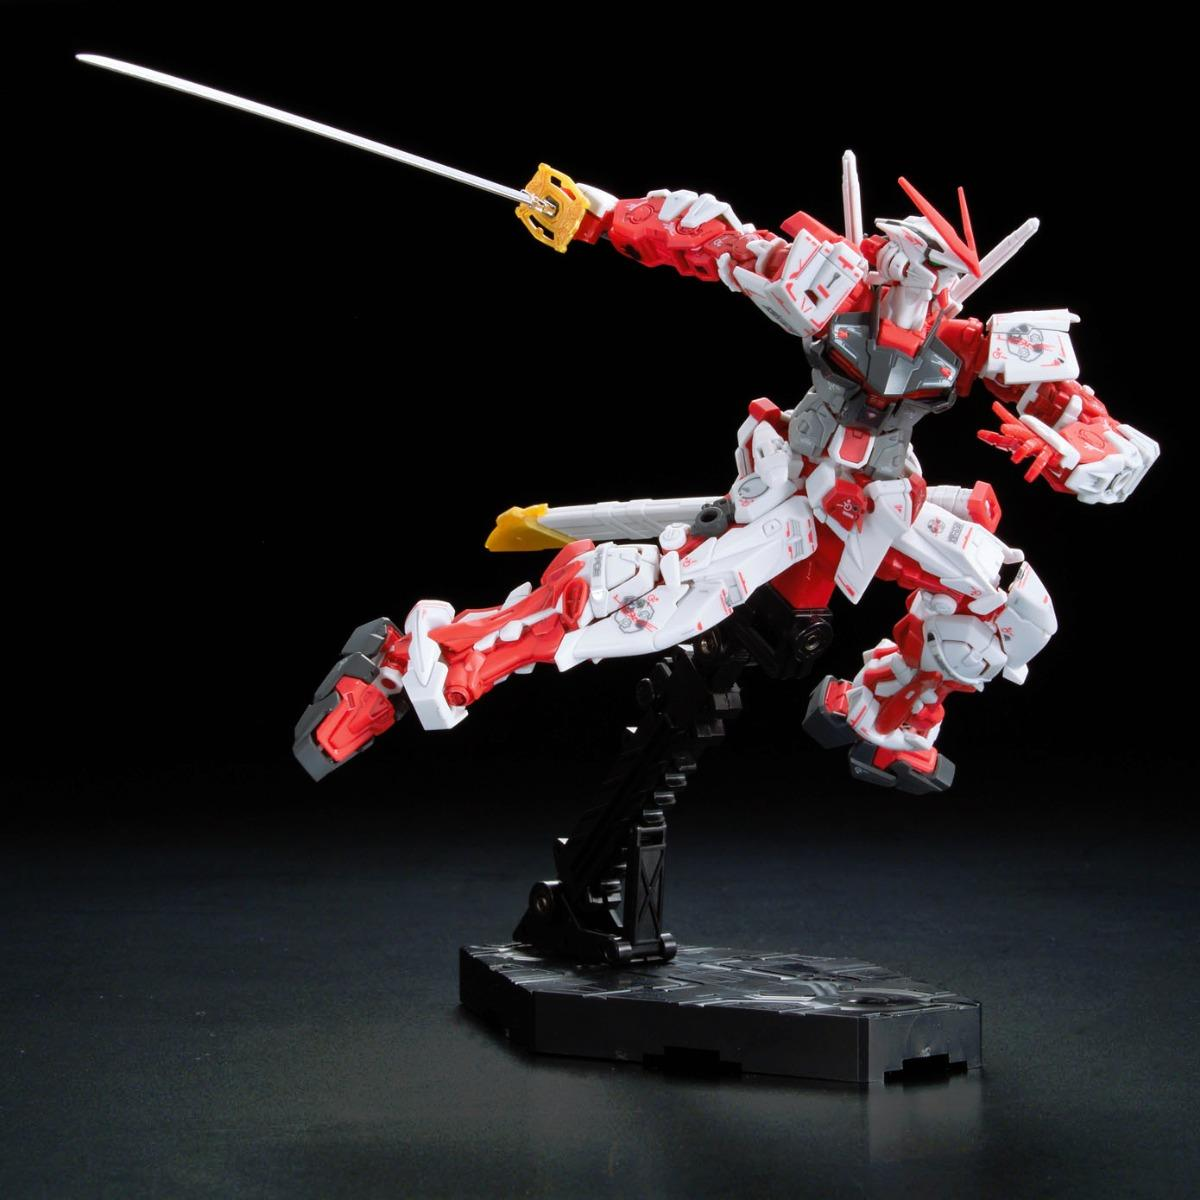 RG MBF-P02 Gundam Astray Red Frame